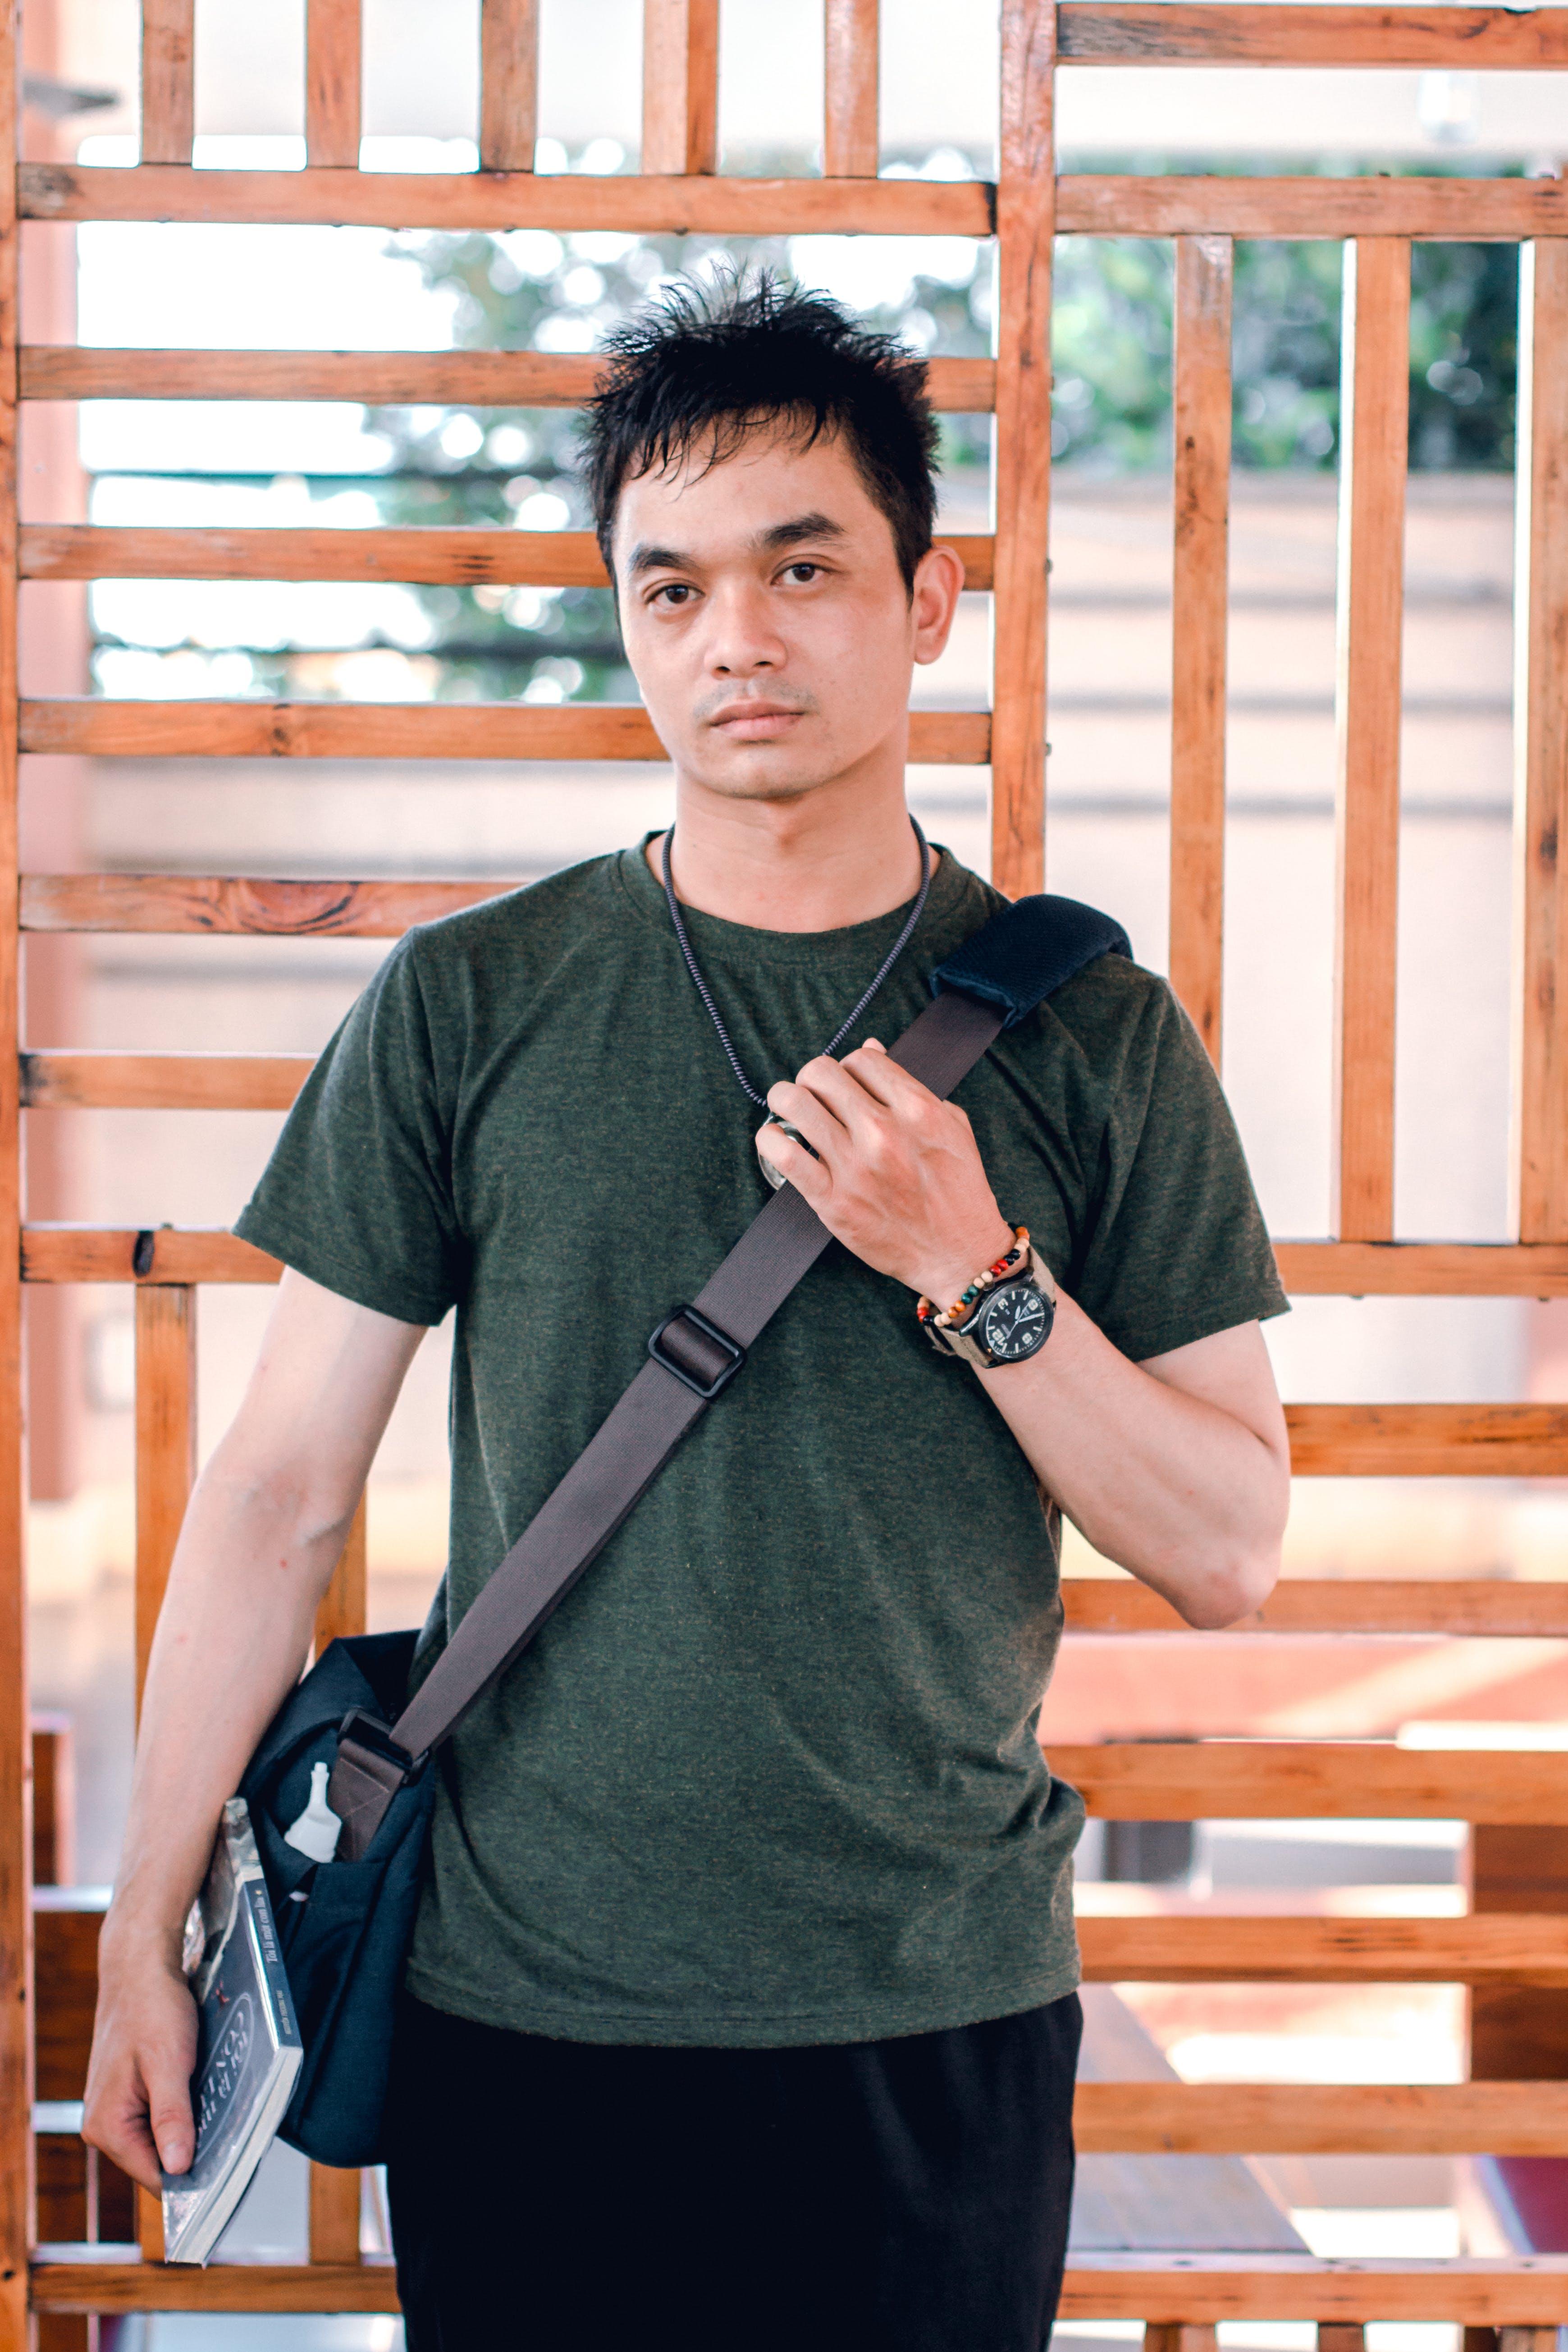 Man Holding Crossbody Bag Standing on Outdoors